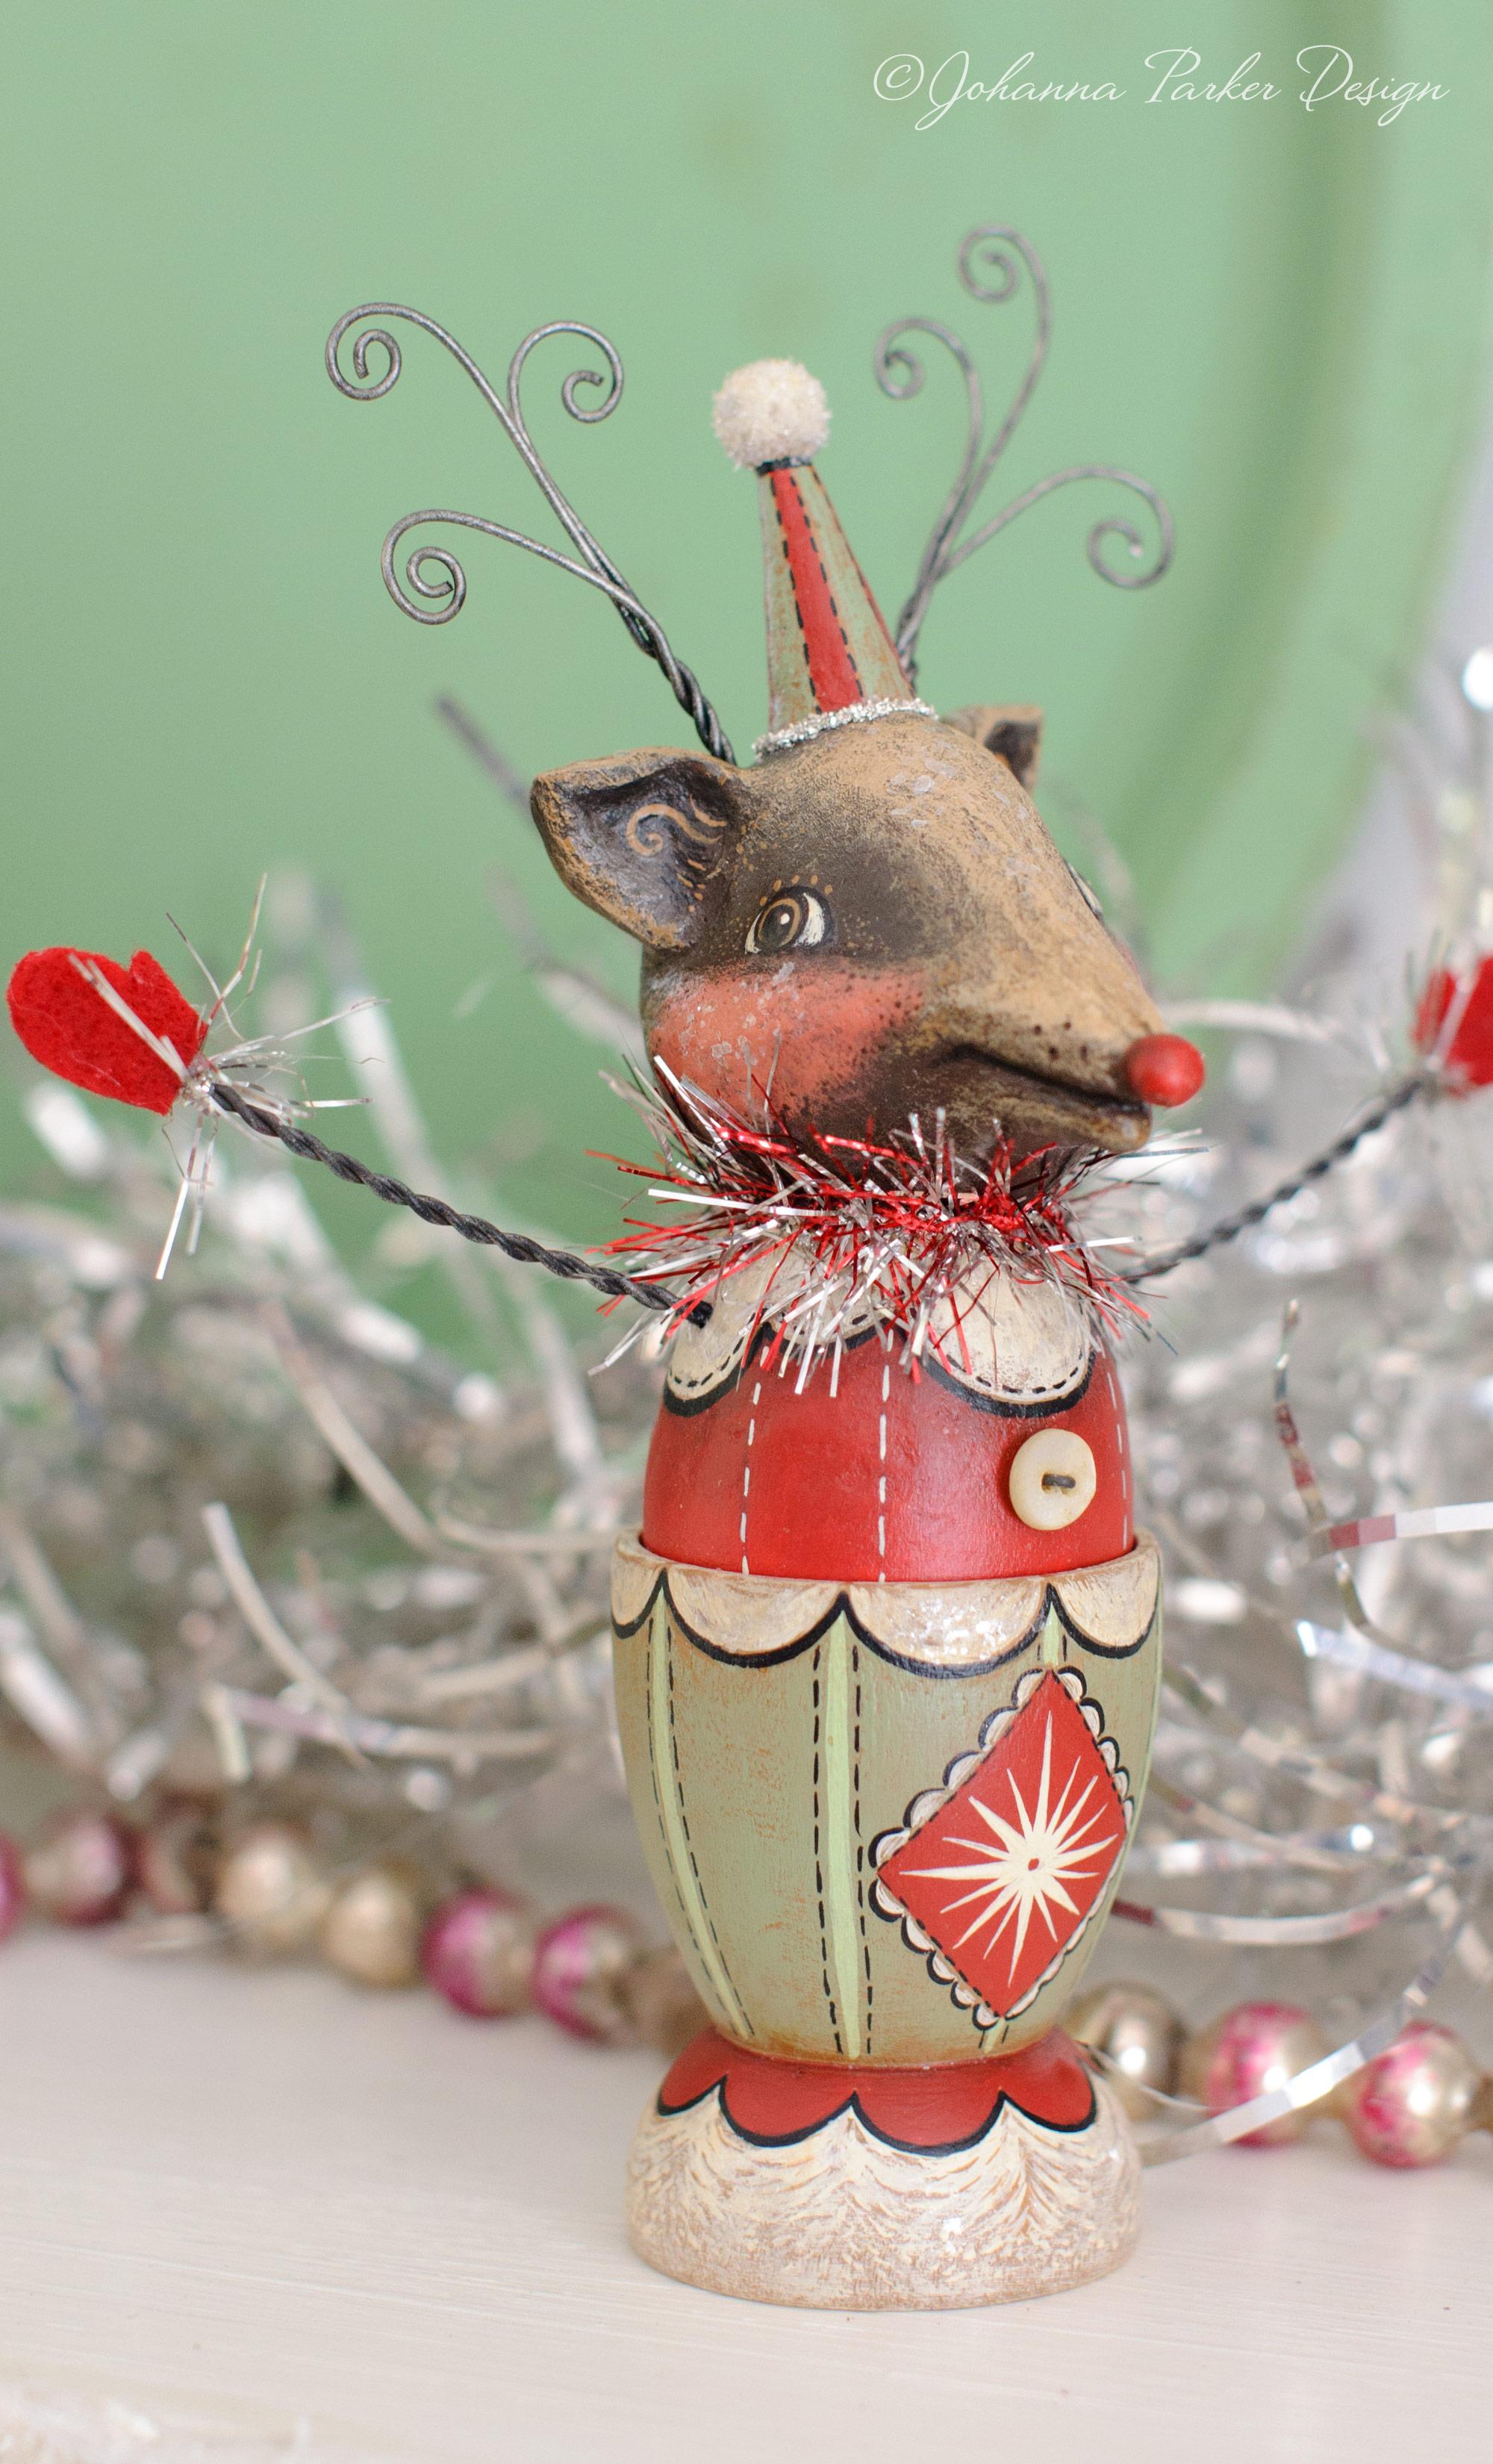 Reindeer egg cup